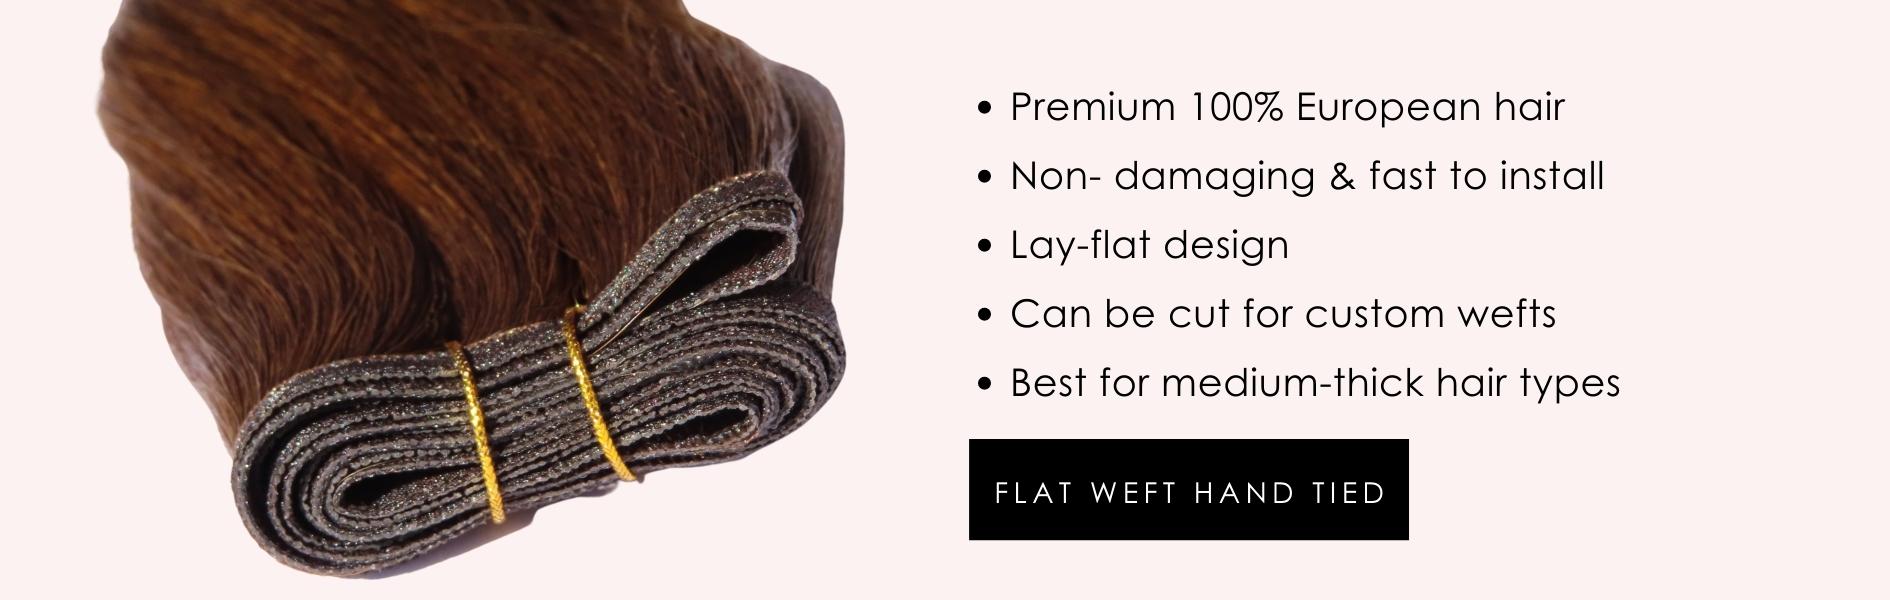 flat-weft-collections-desktop-cashmere-hair.jpg